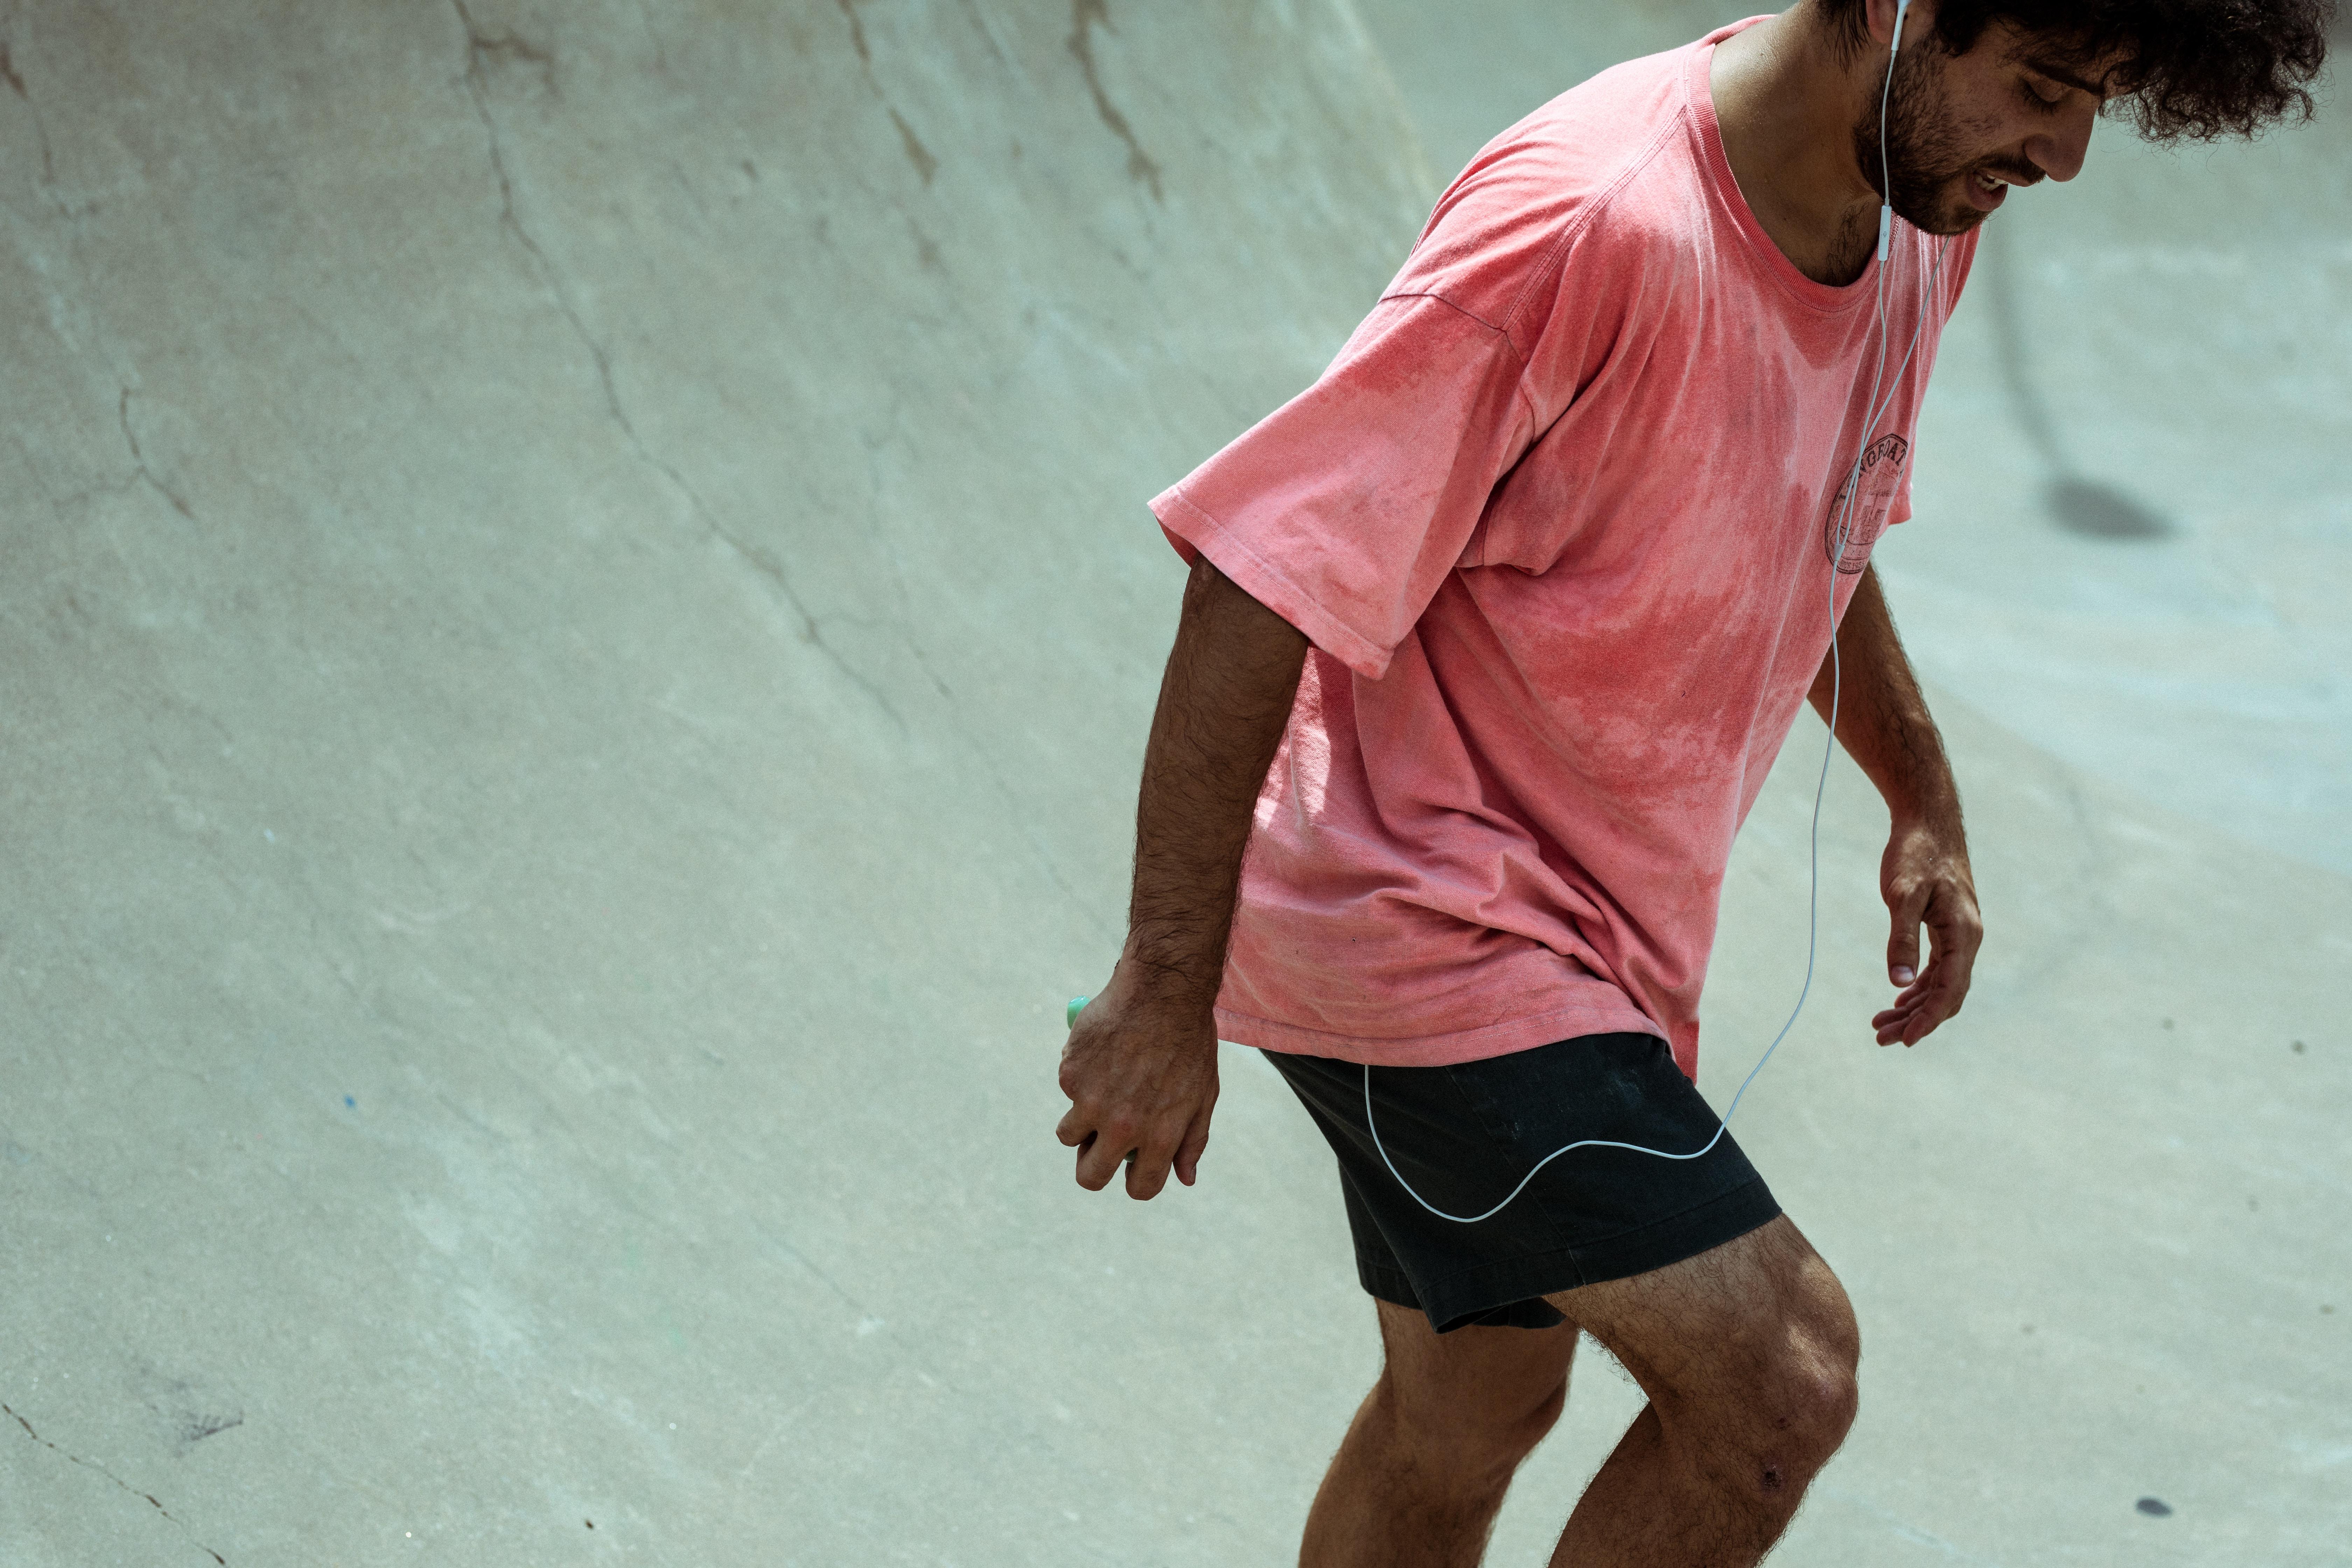 man standing on skateboard track